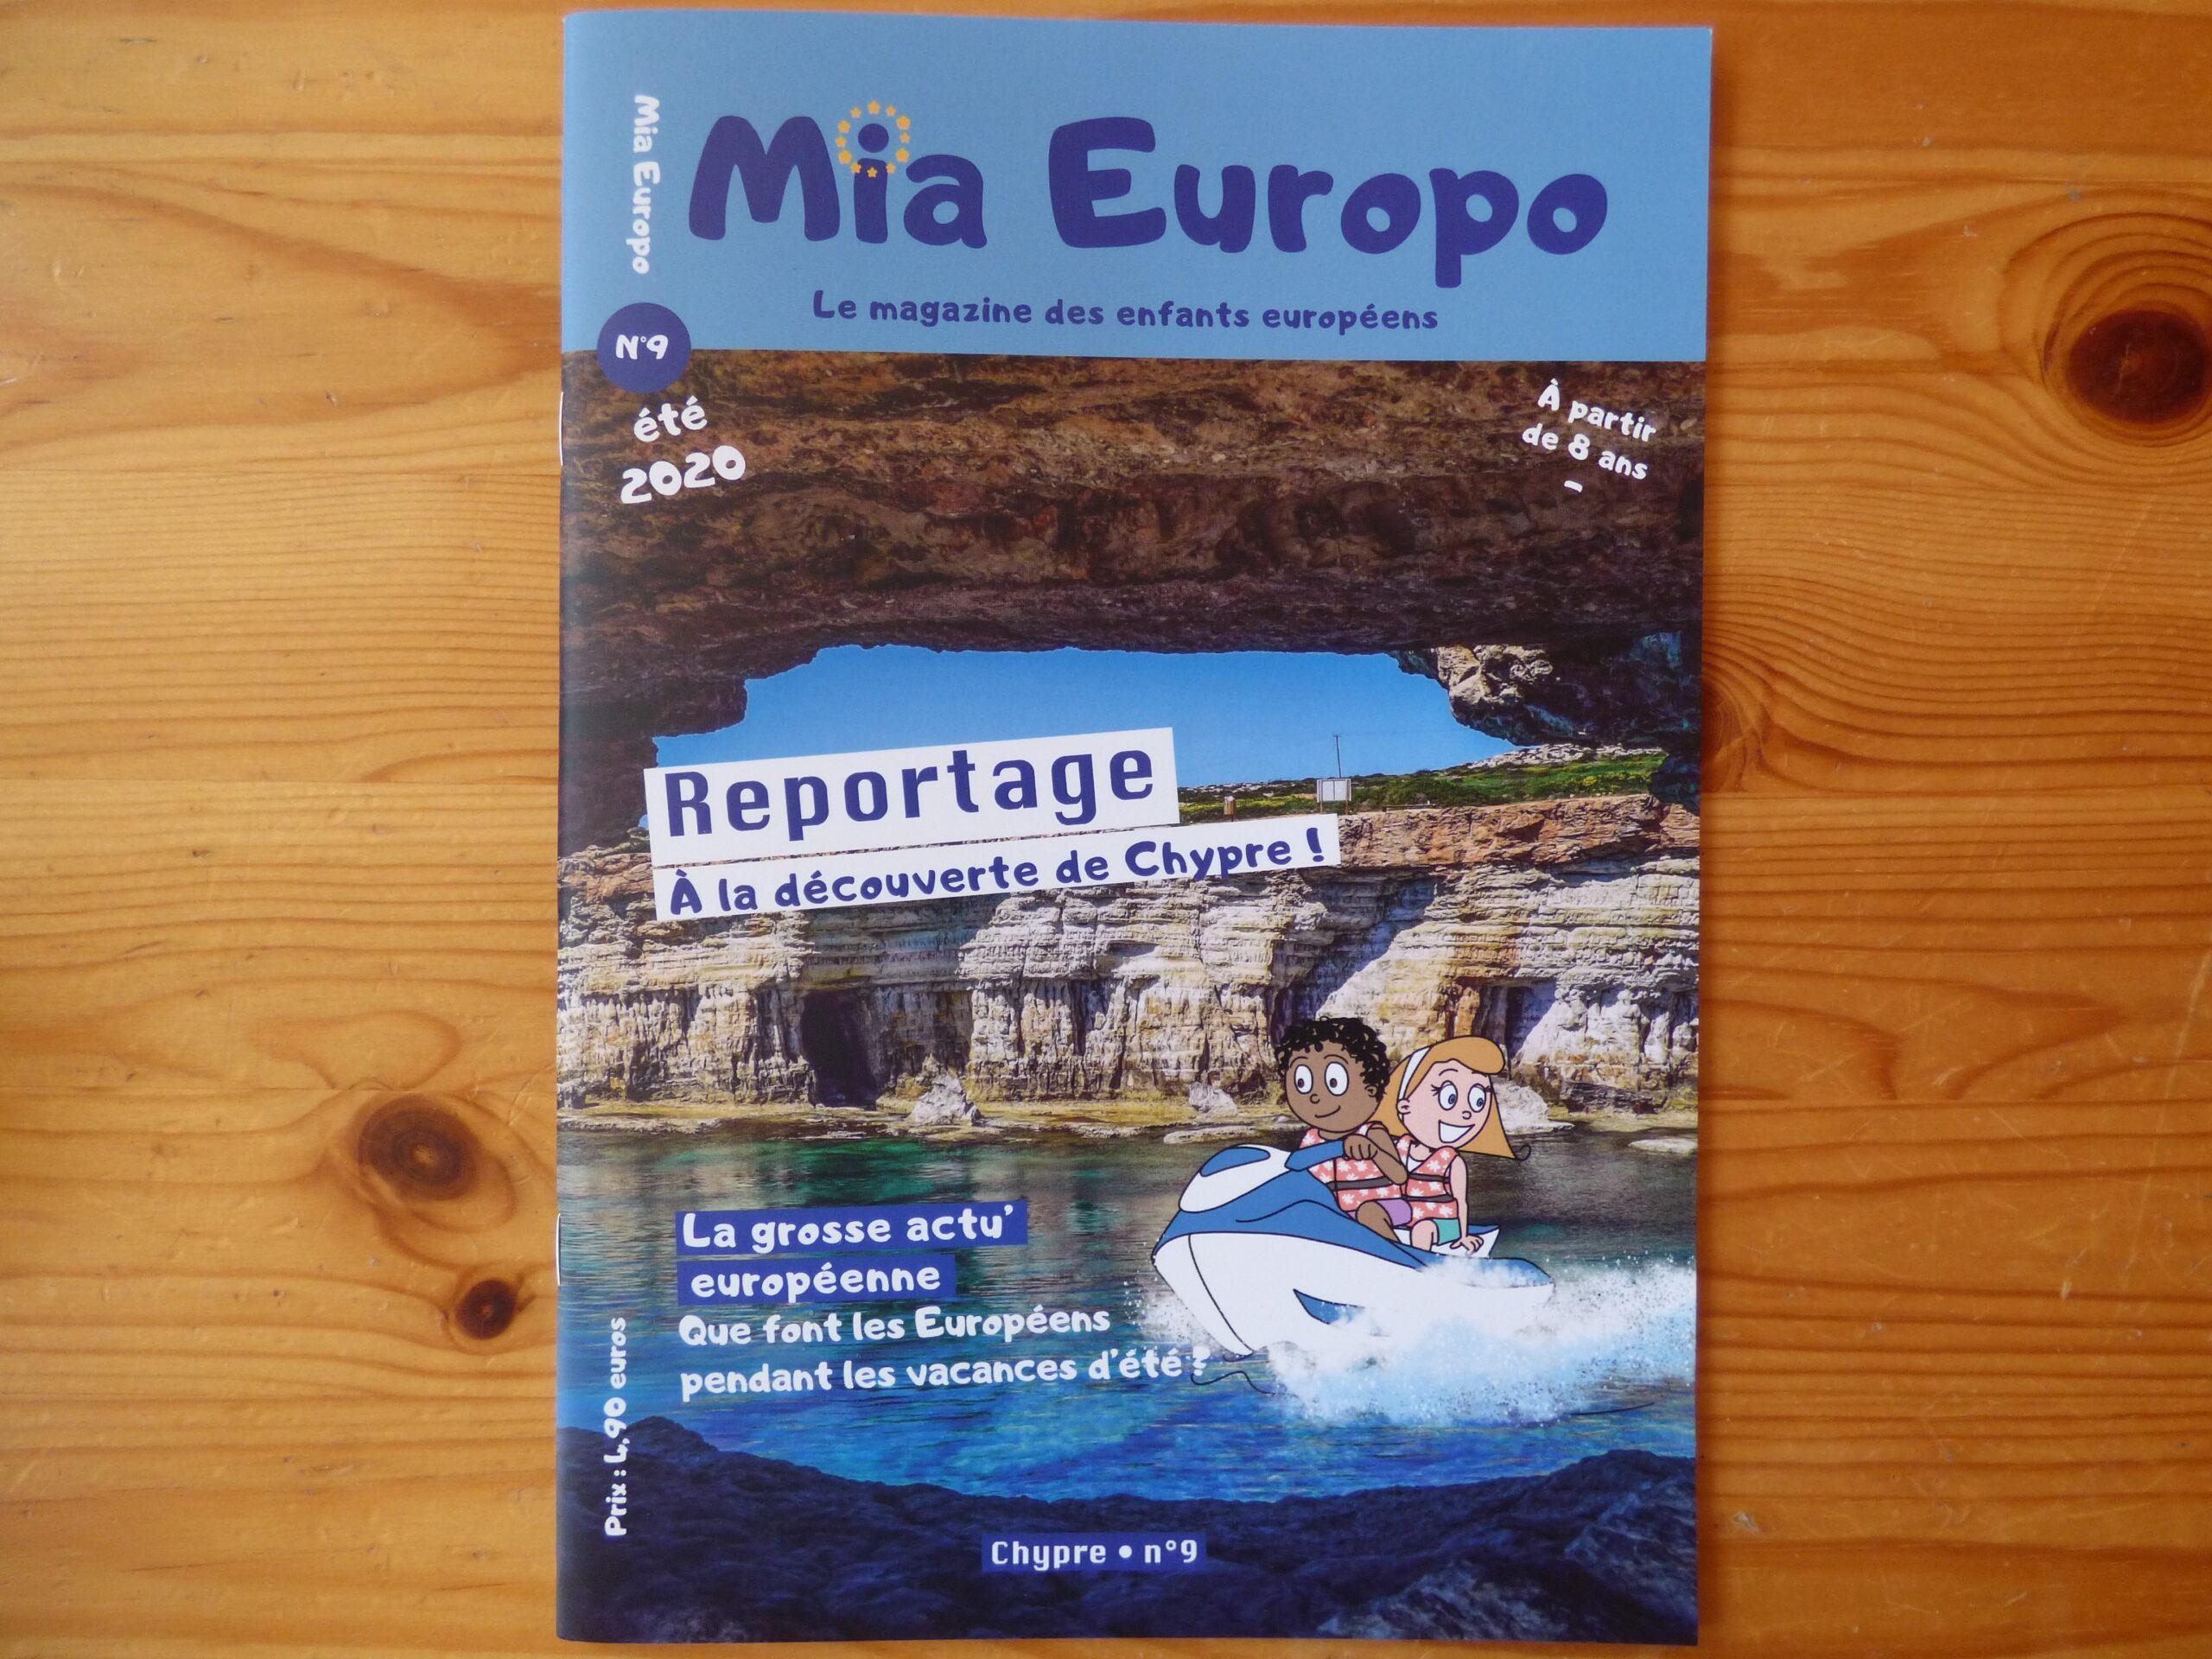 Mia Europo à Chypre, couverture